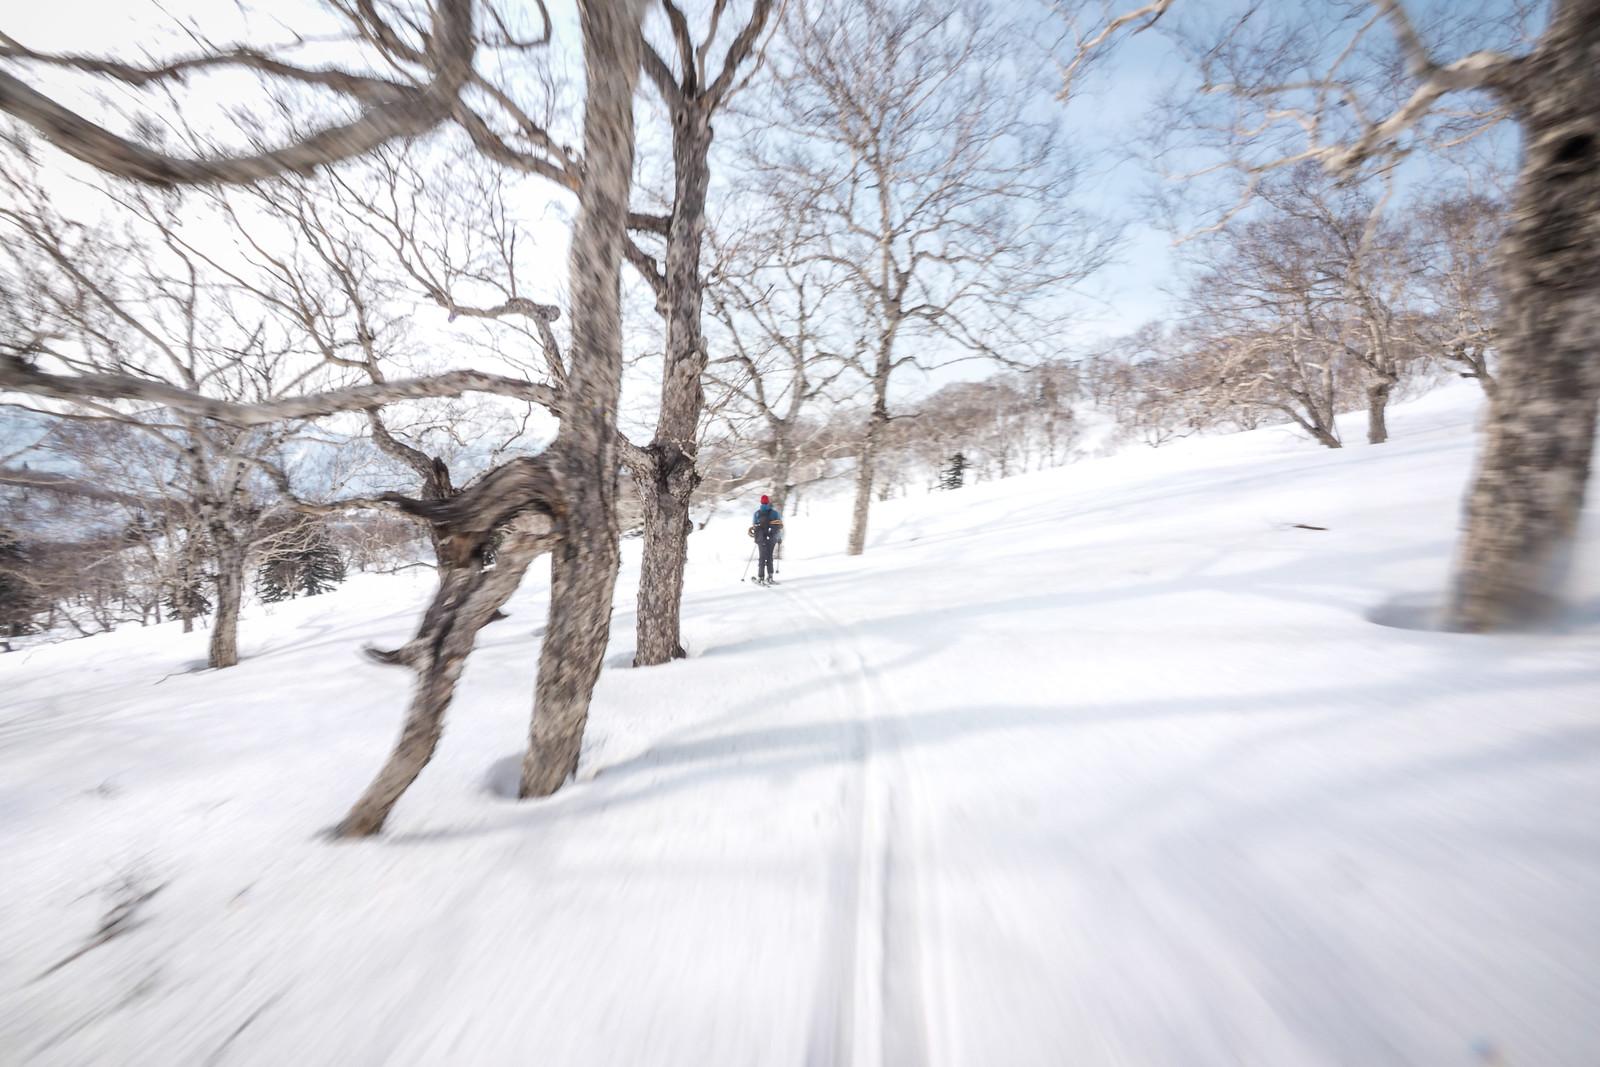 Mt. Yoichi descent (Hokkaido, Japan)